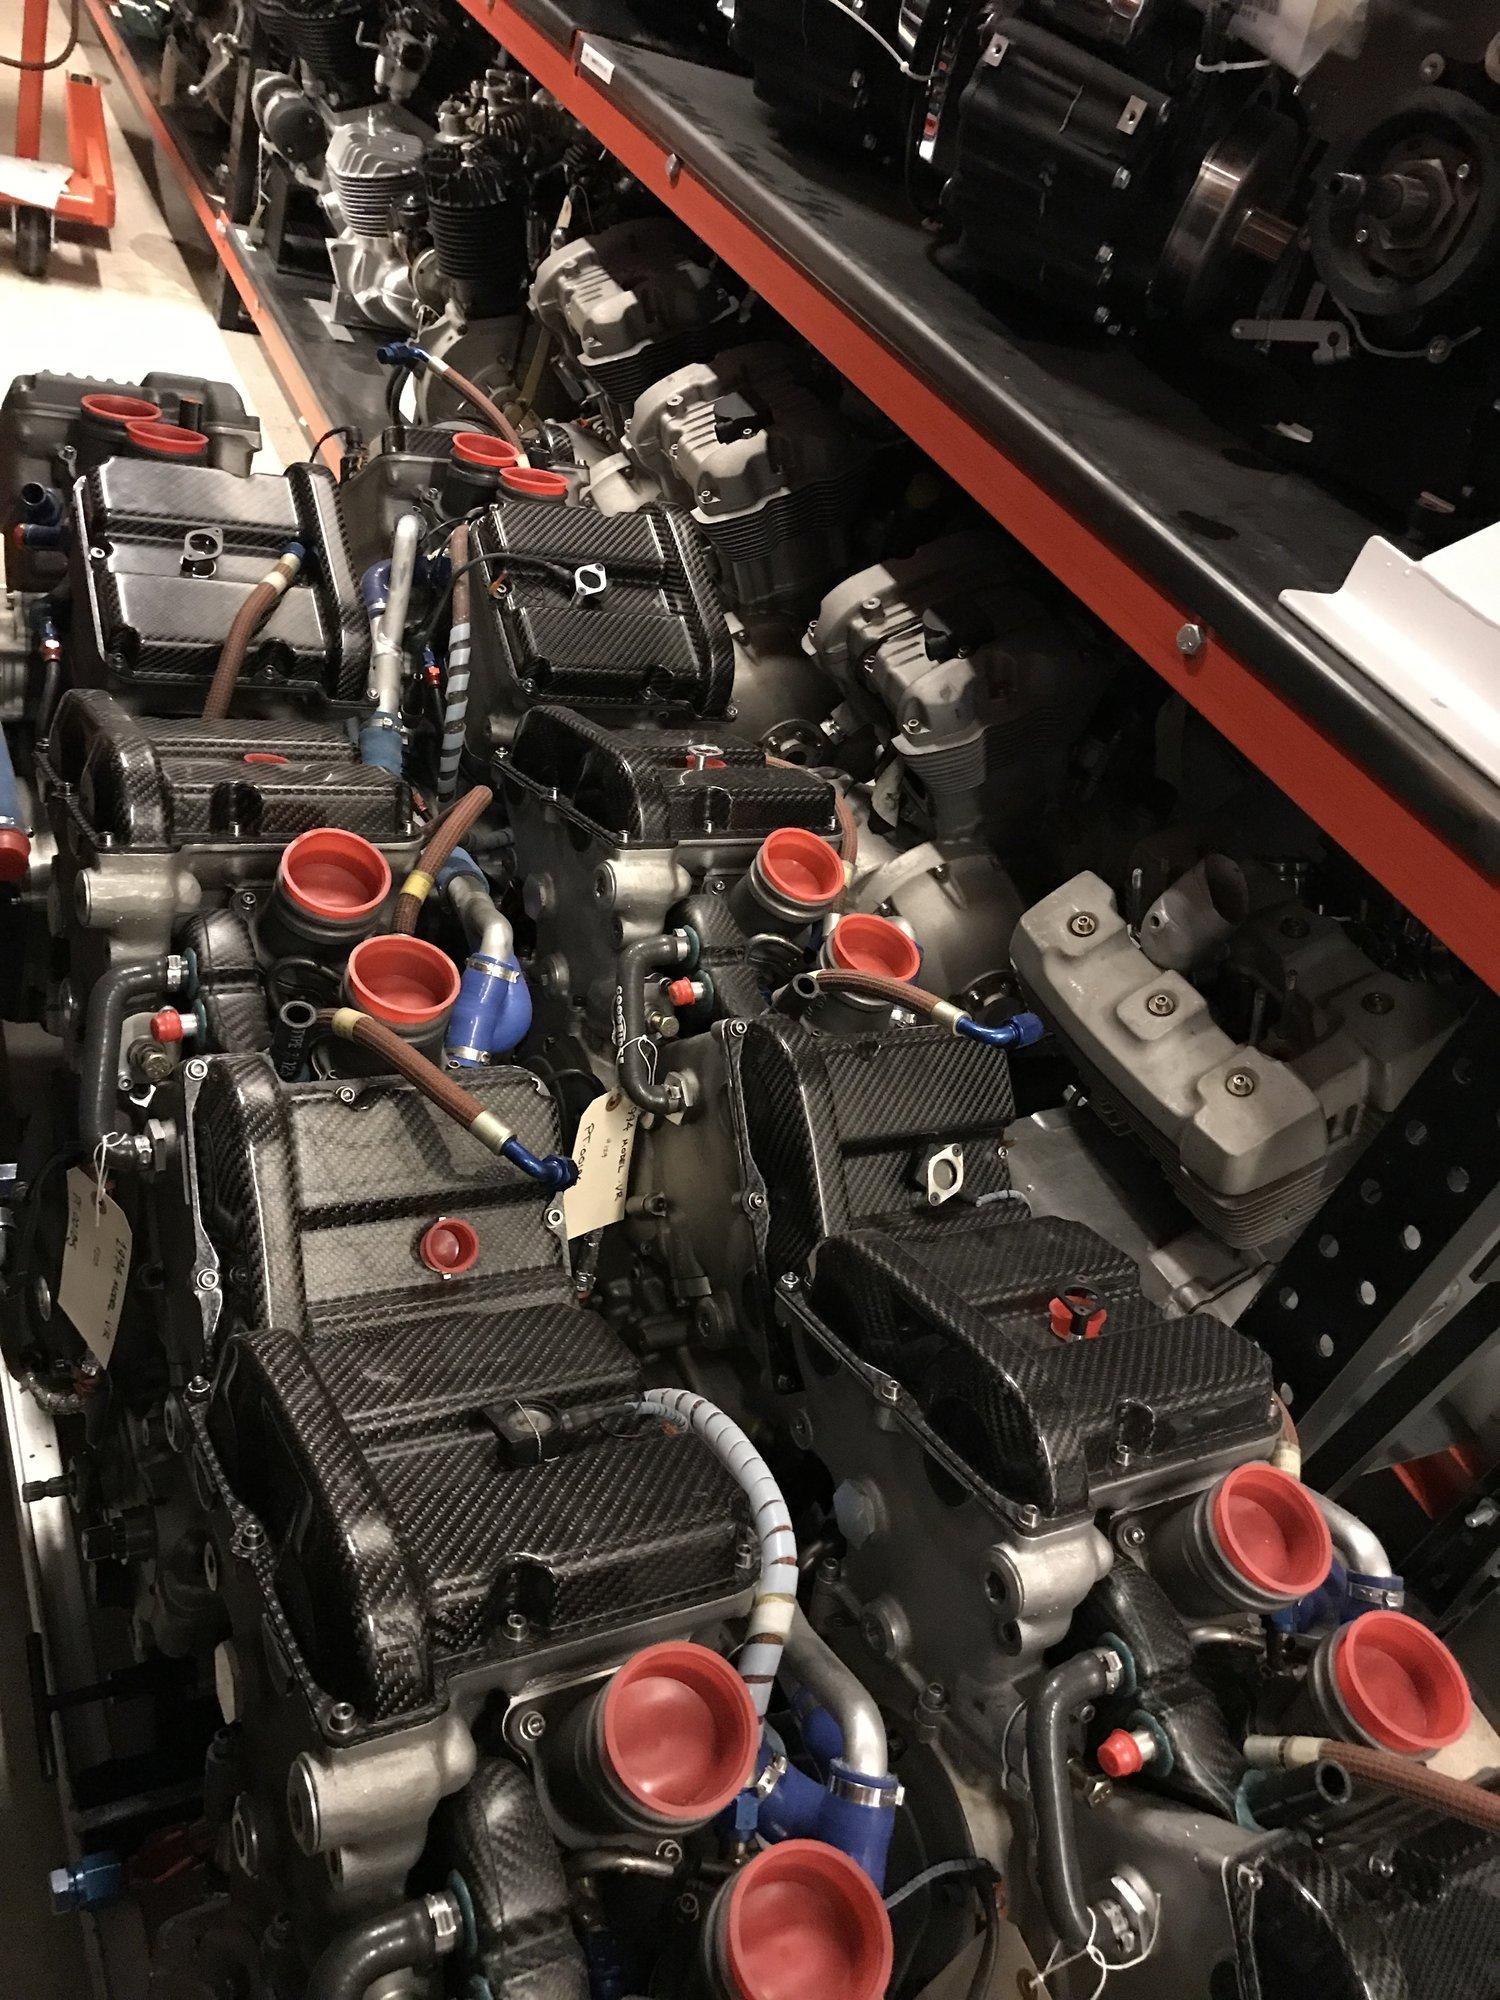 VR1000 engines H-D museum.jpg